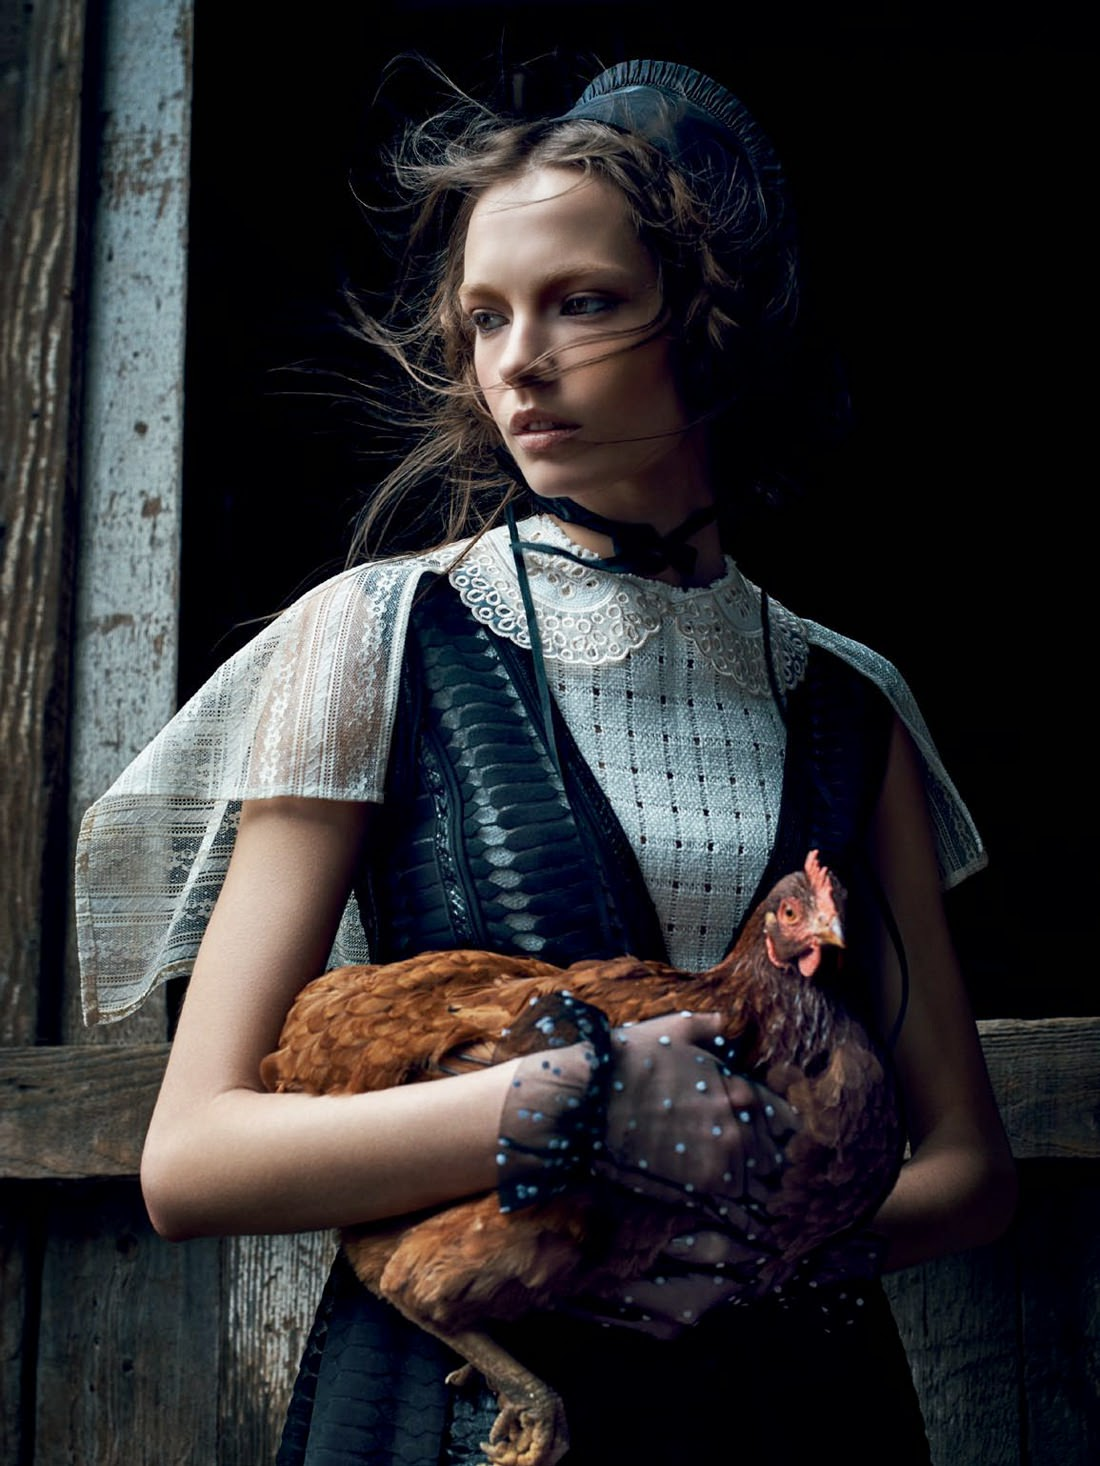 Fashion Model @ Mina Cvetkovic By Nathaniel Goldberg For Vogue Russia March 2015